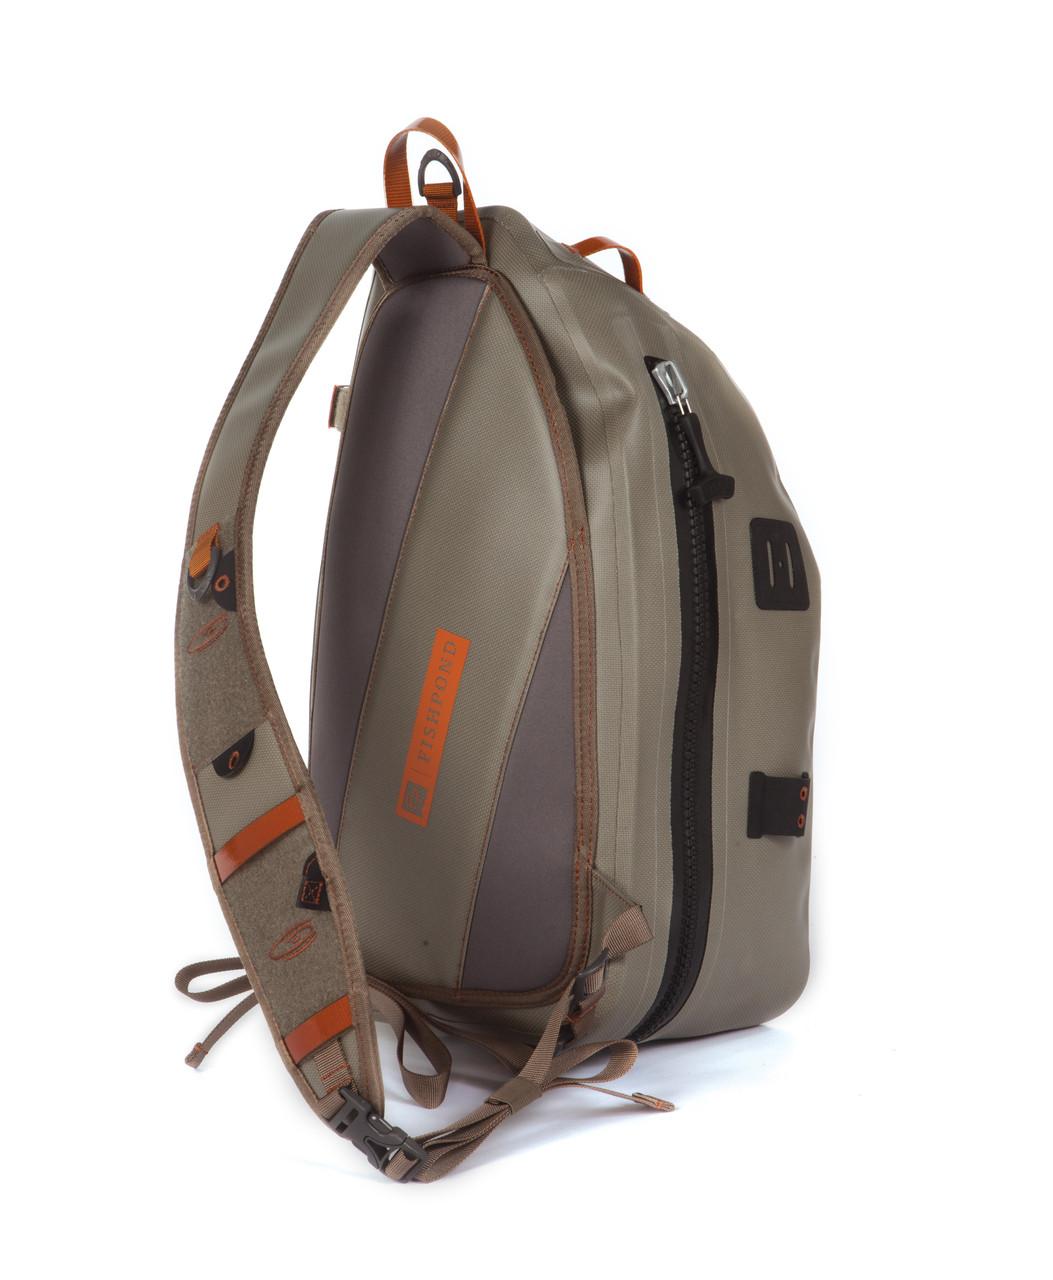 Fishpond Thunderhead Submersible Sling Pack, Shale